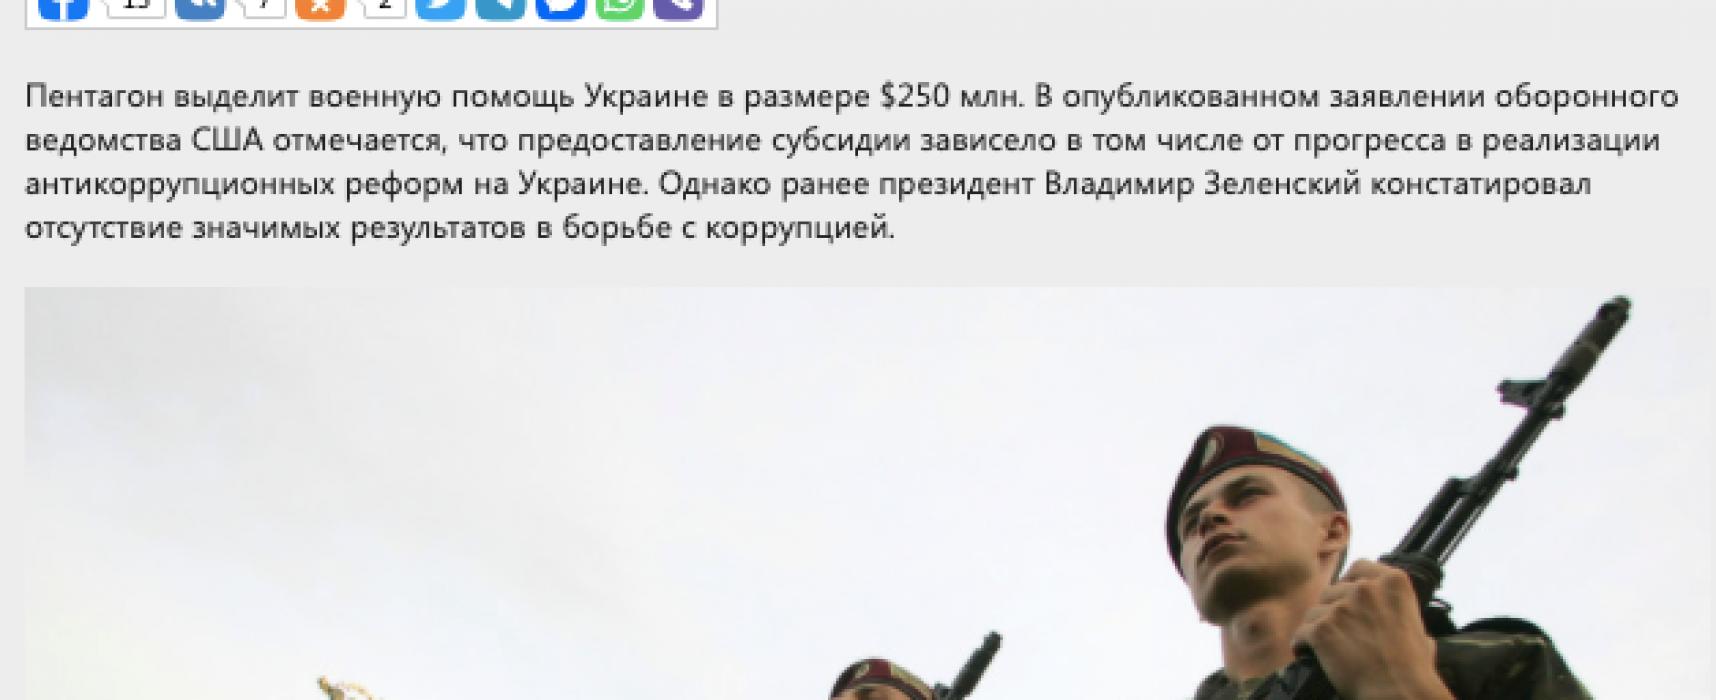 Fake: Kyiv Uses Pentagon Help against Donbas Civilian Population